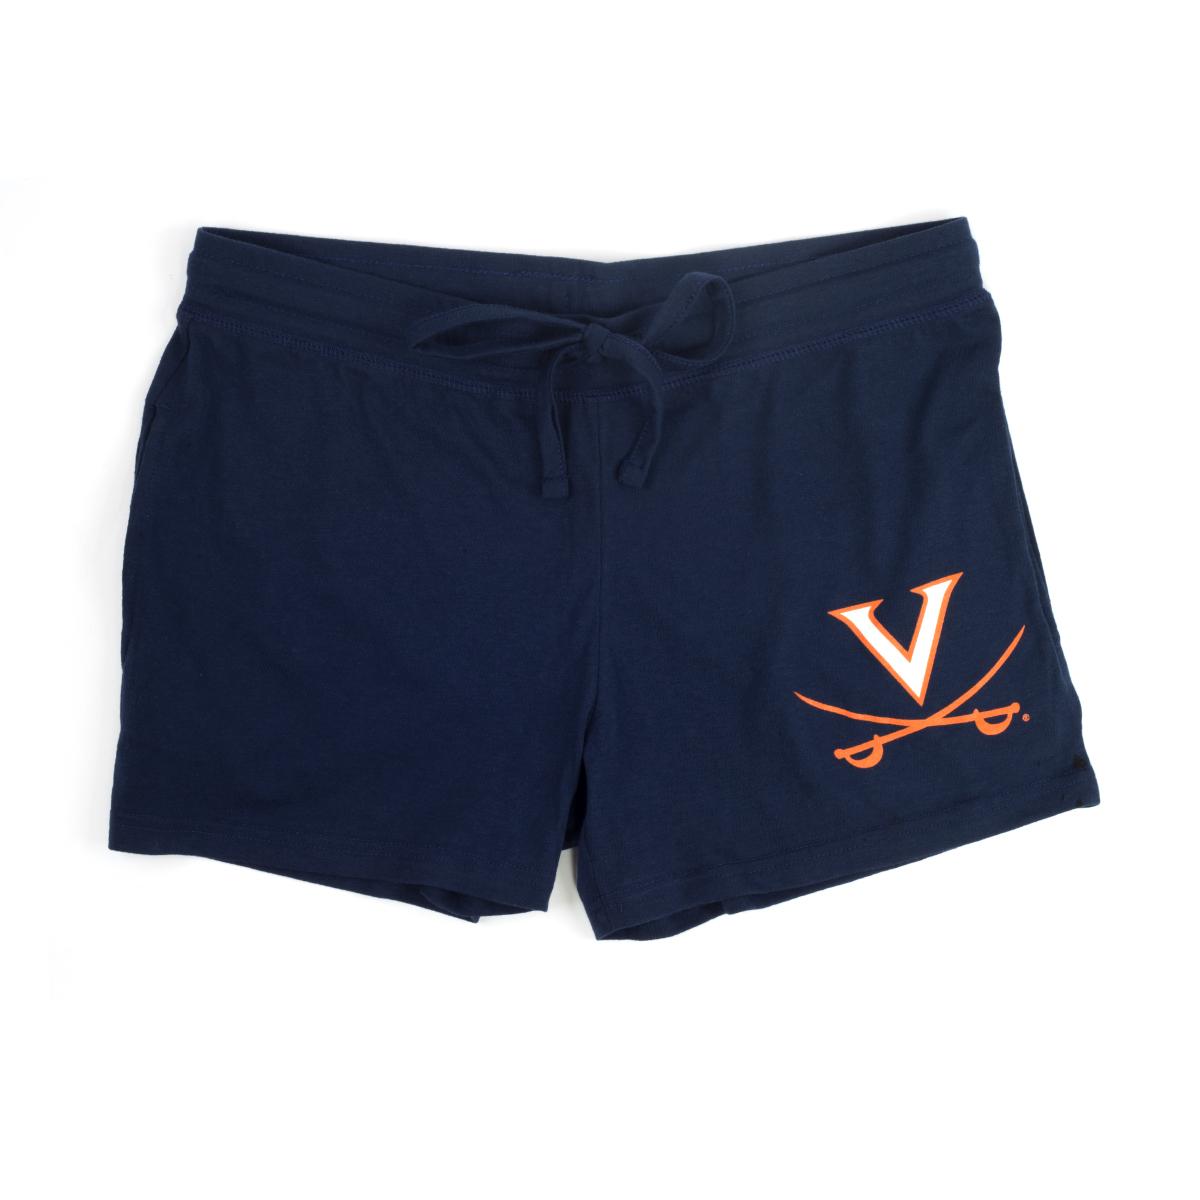 University of Virginia Cavaliers Ladies Shorts